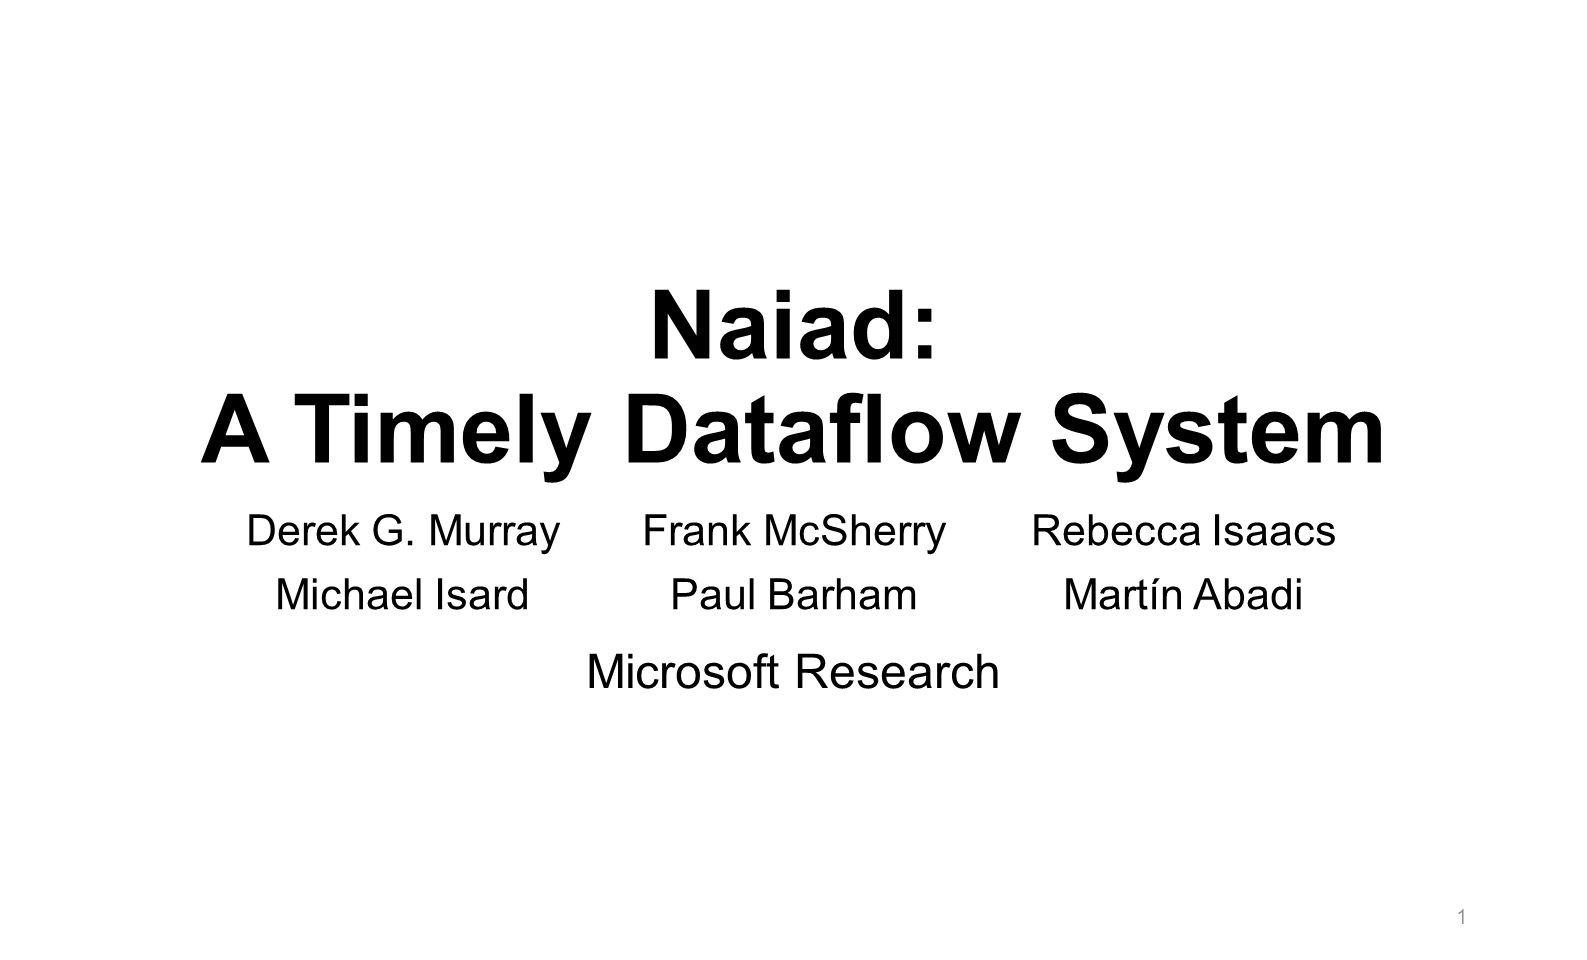 Naiad: A Timely Dataflow System Derek G. Murray Michael Isard Frank McSherry Paul Barham Rebecca Isaacs Martín Abadi Microsoft Research 1